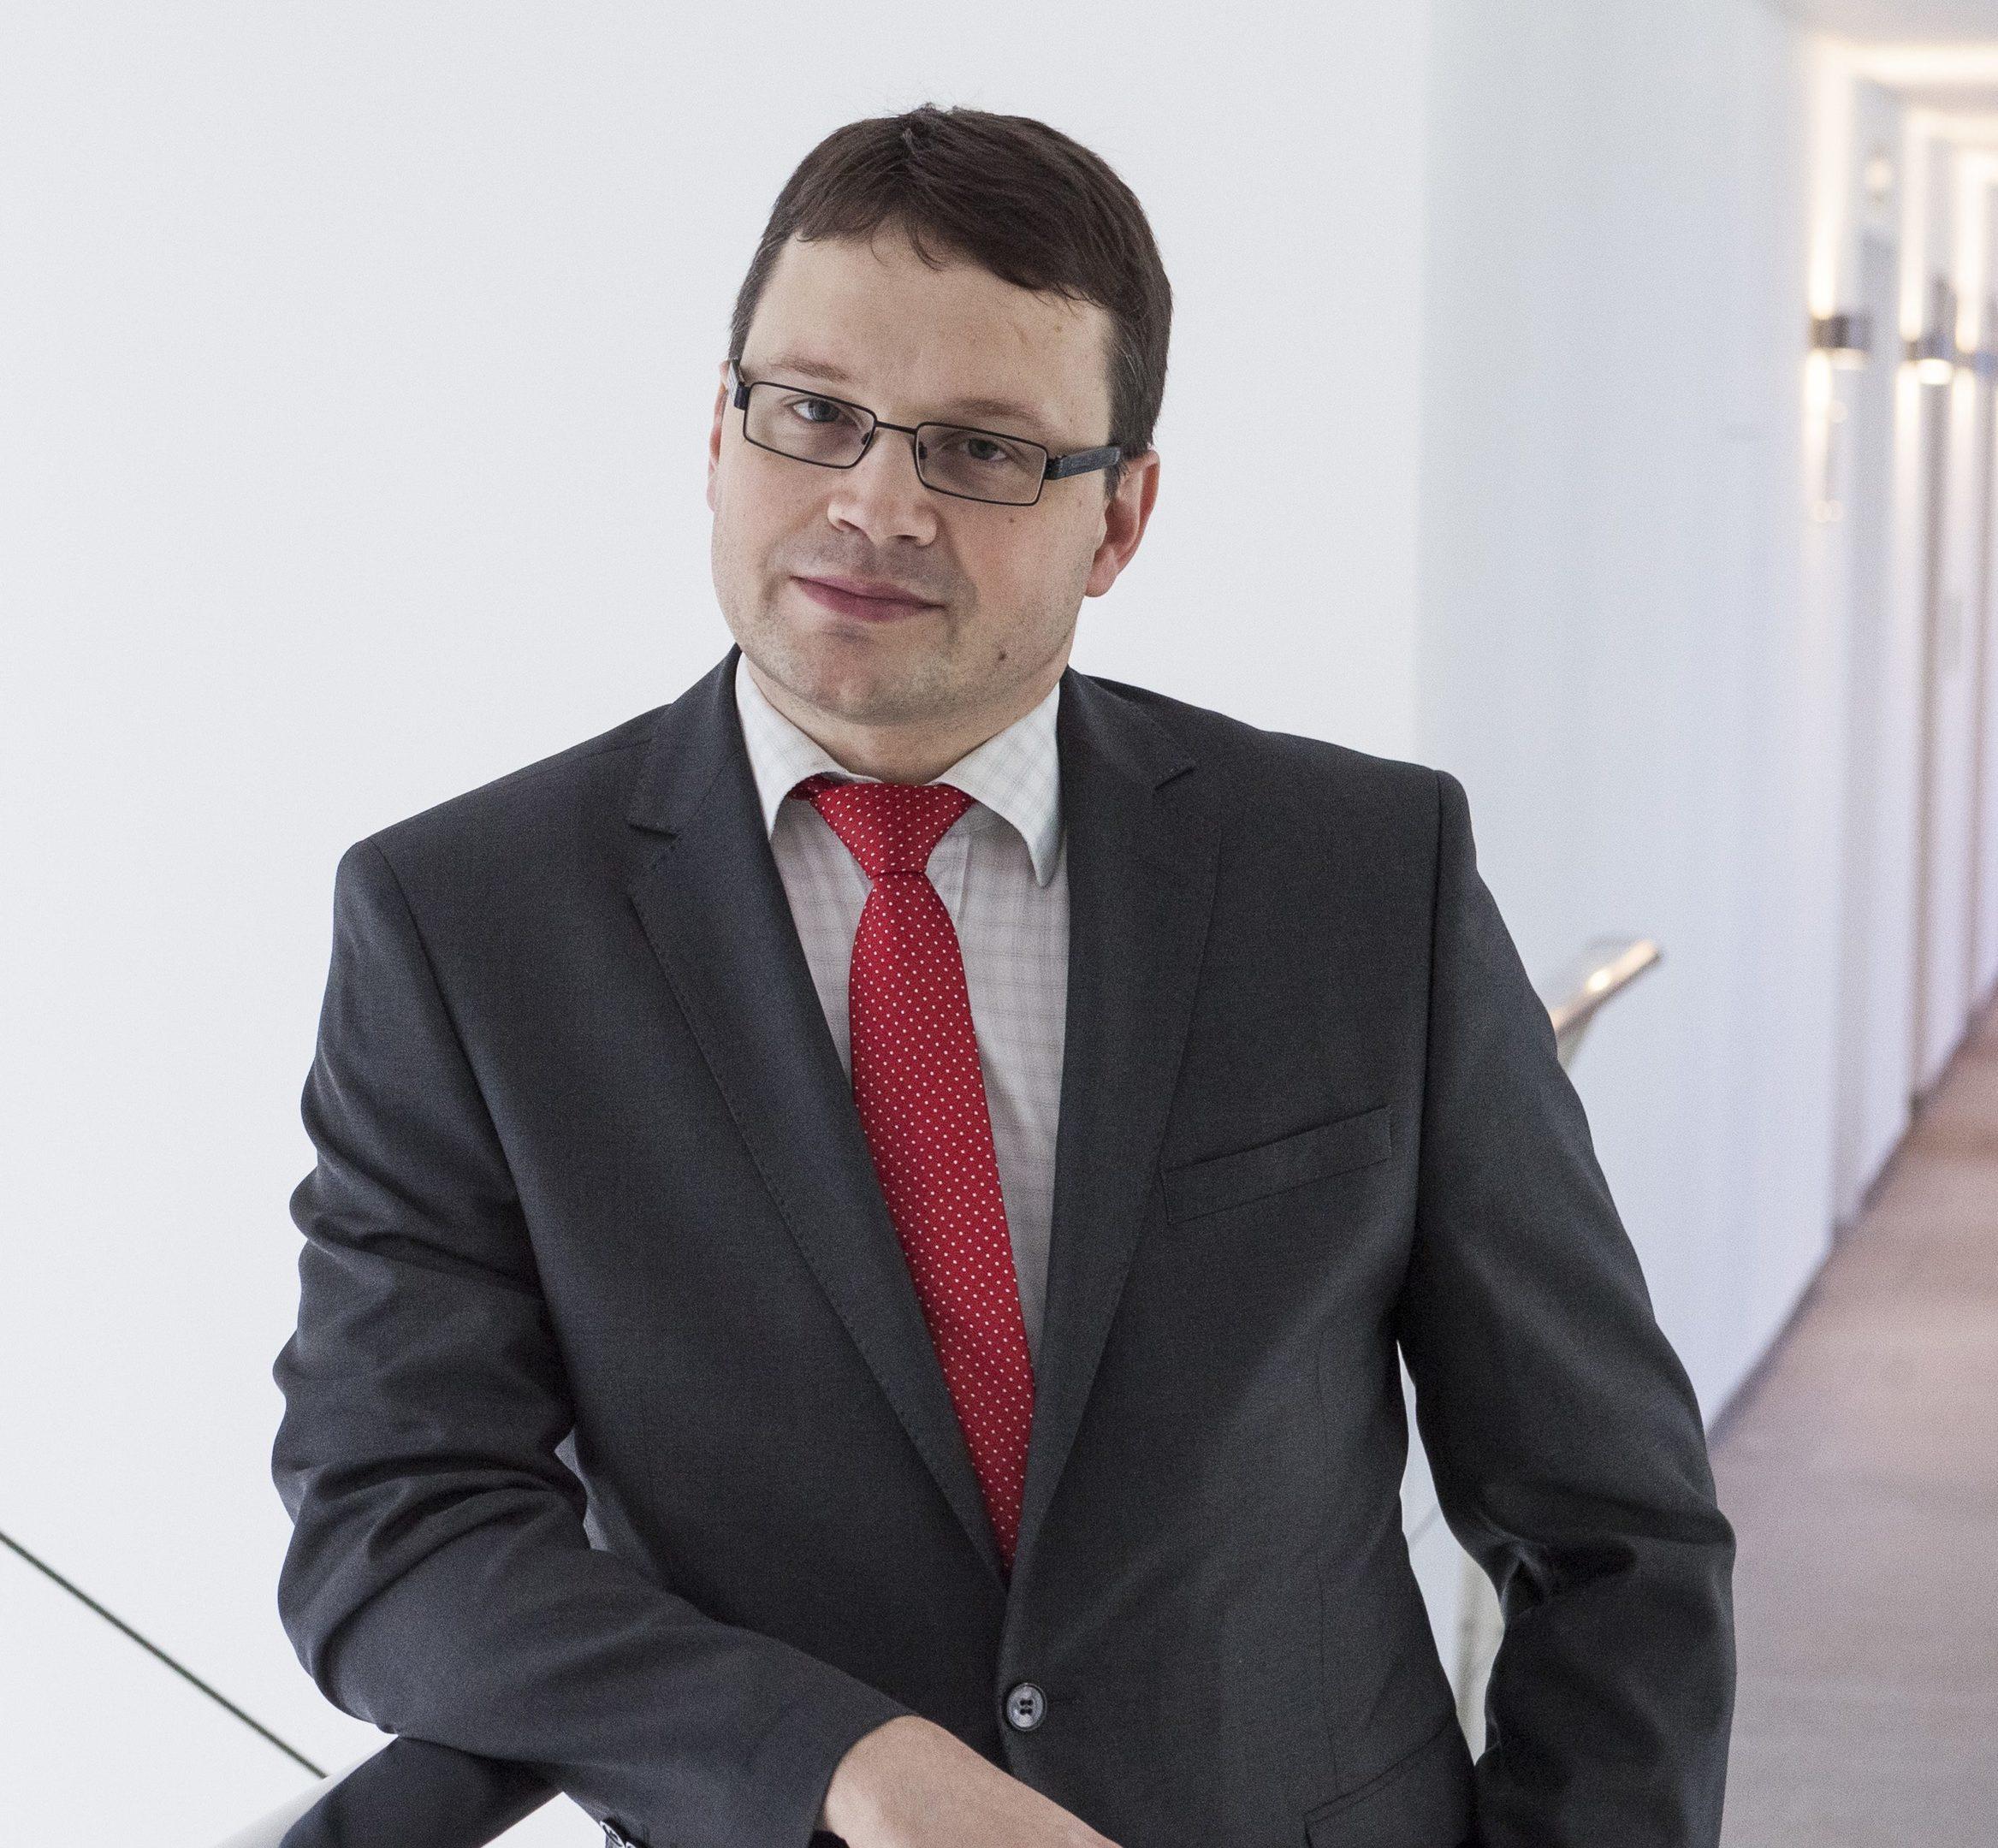 Ben Arabo, chief executive of Atlantic Petroleum